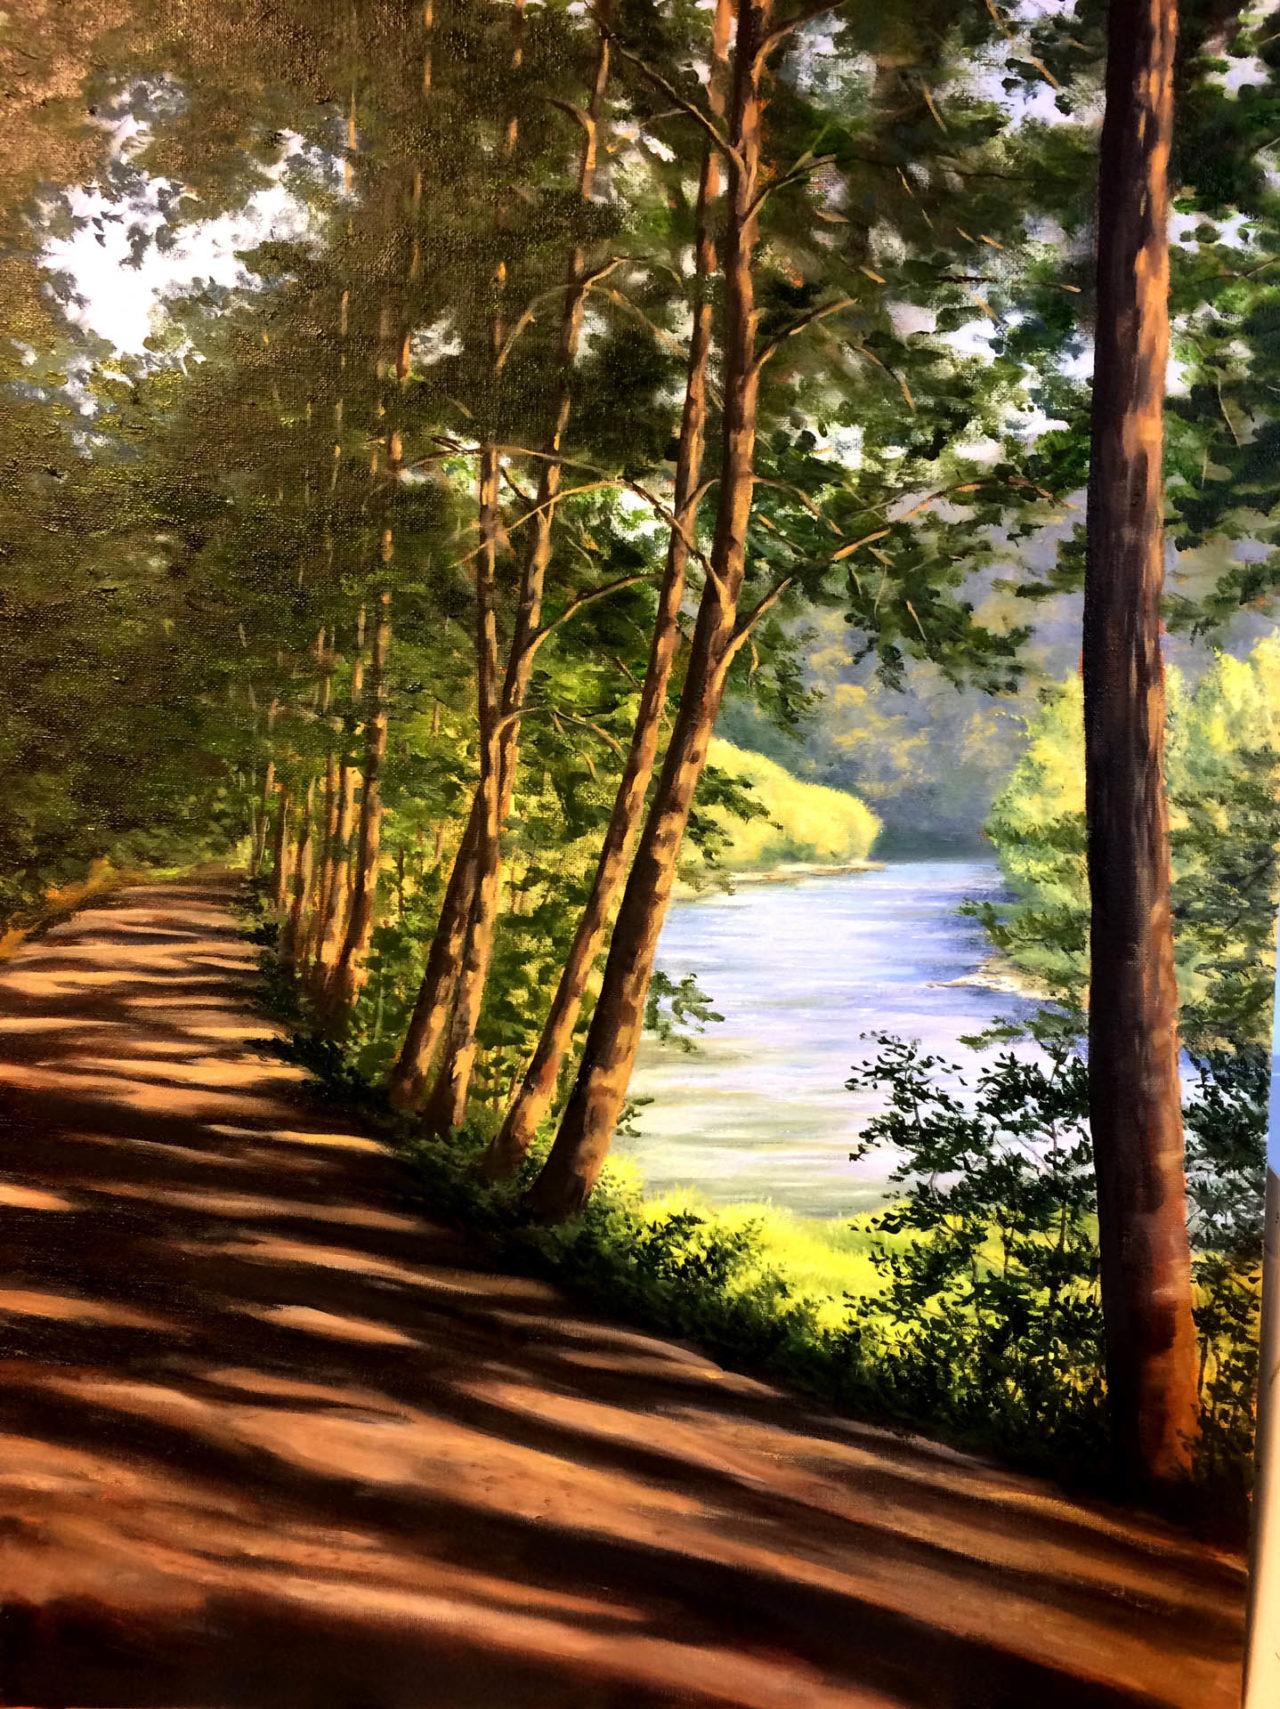 Along Pine Creek - Don Baylor